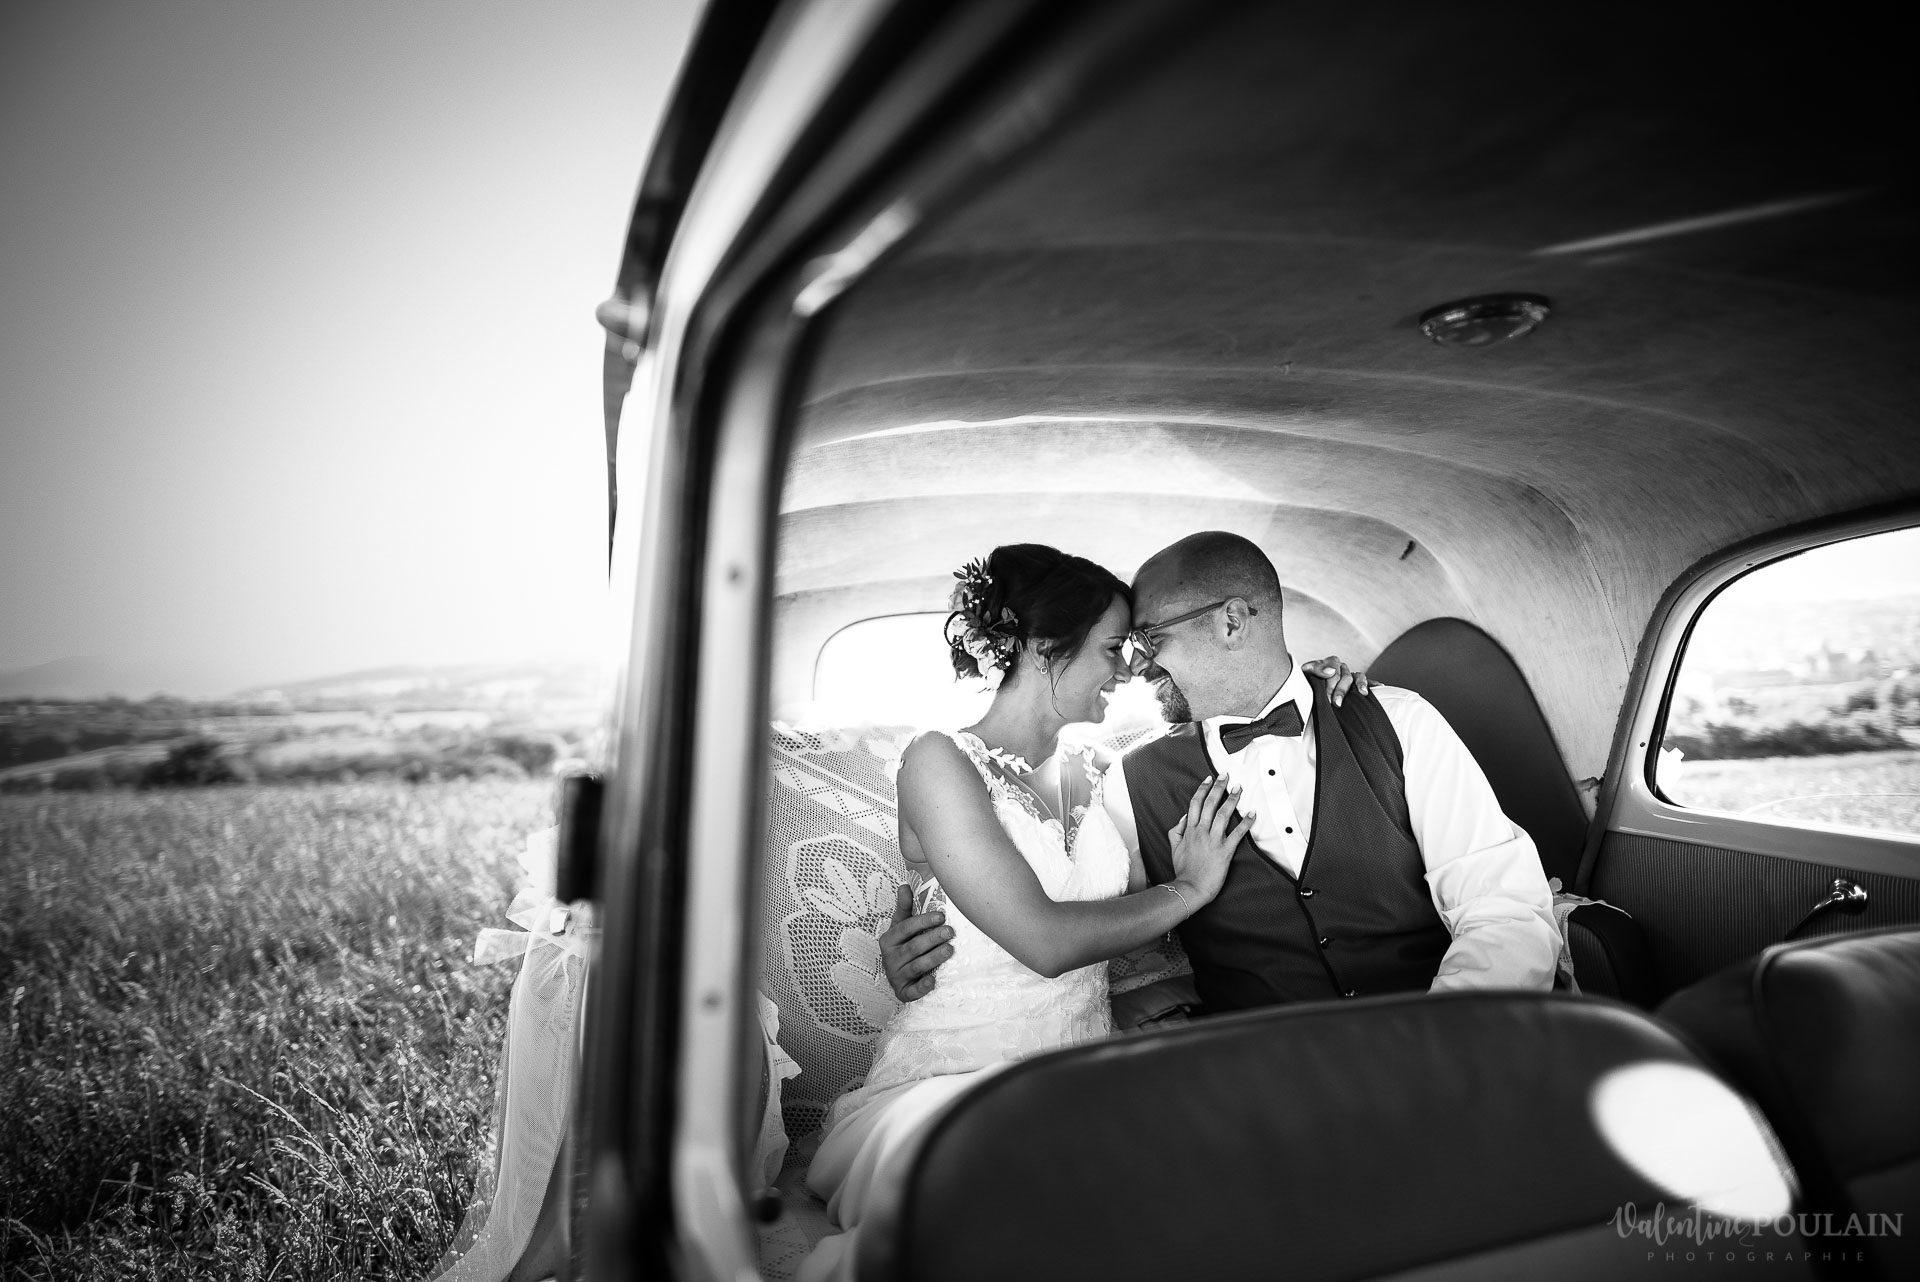 Mariage convivial Saverne - Valentine Poulain voiture